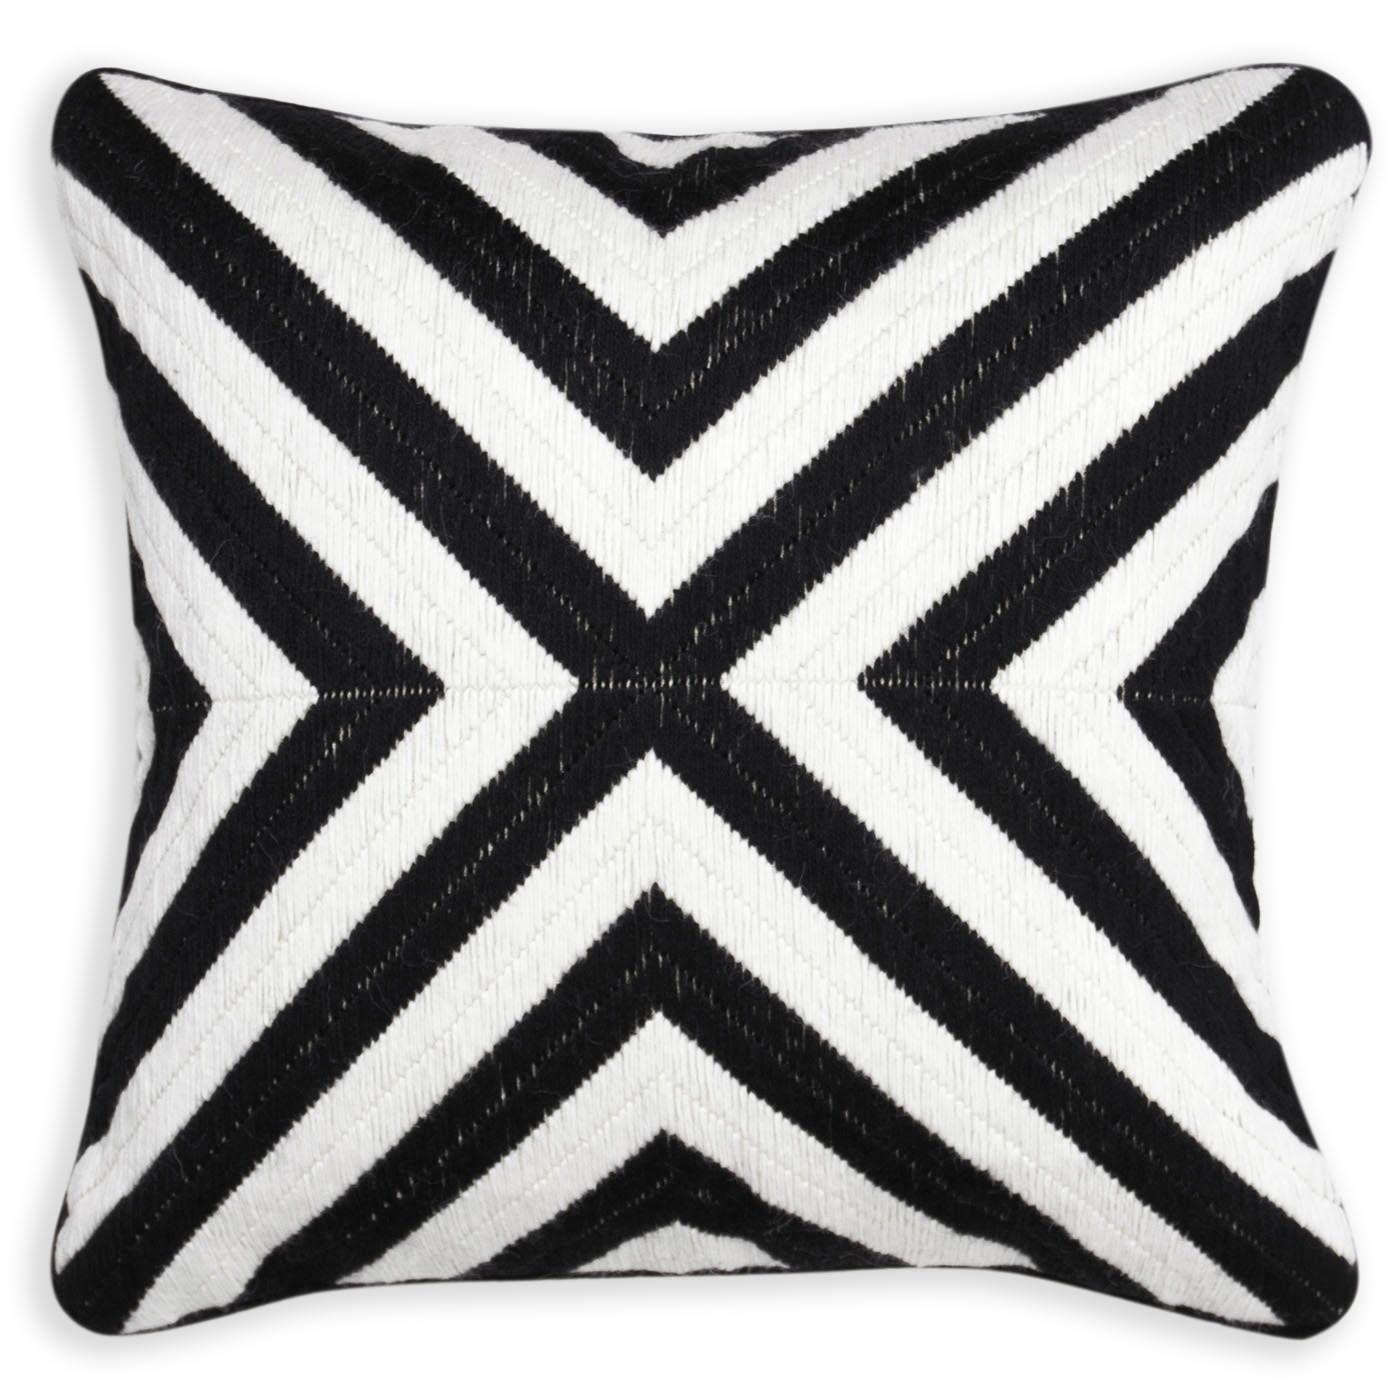 Black and white bridget bargello throw pillow modern décor pillows jonathan adler